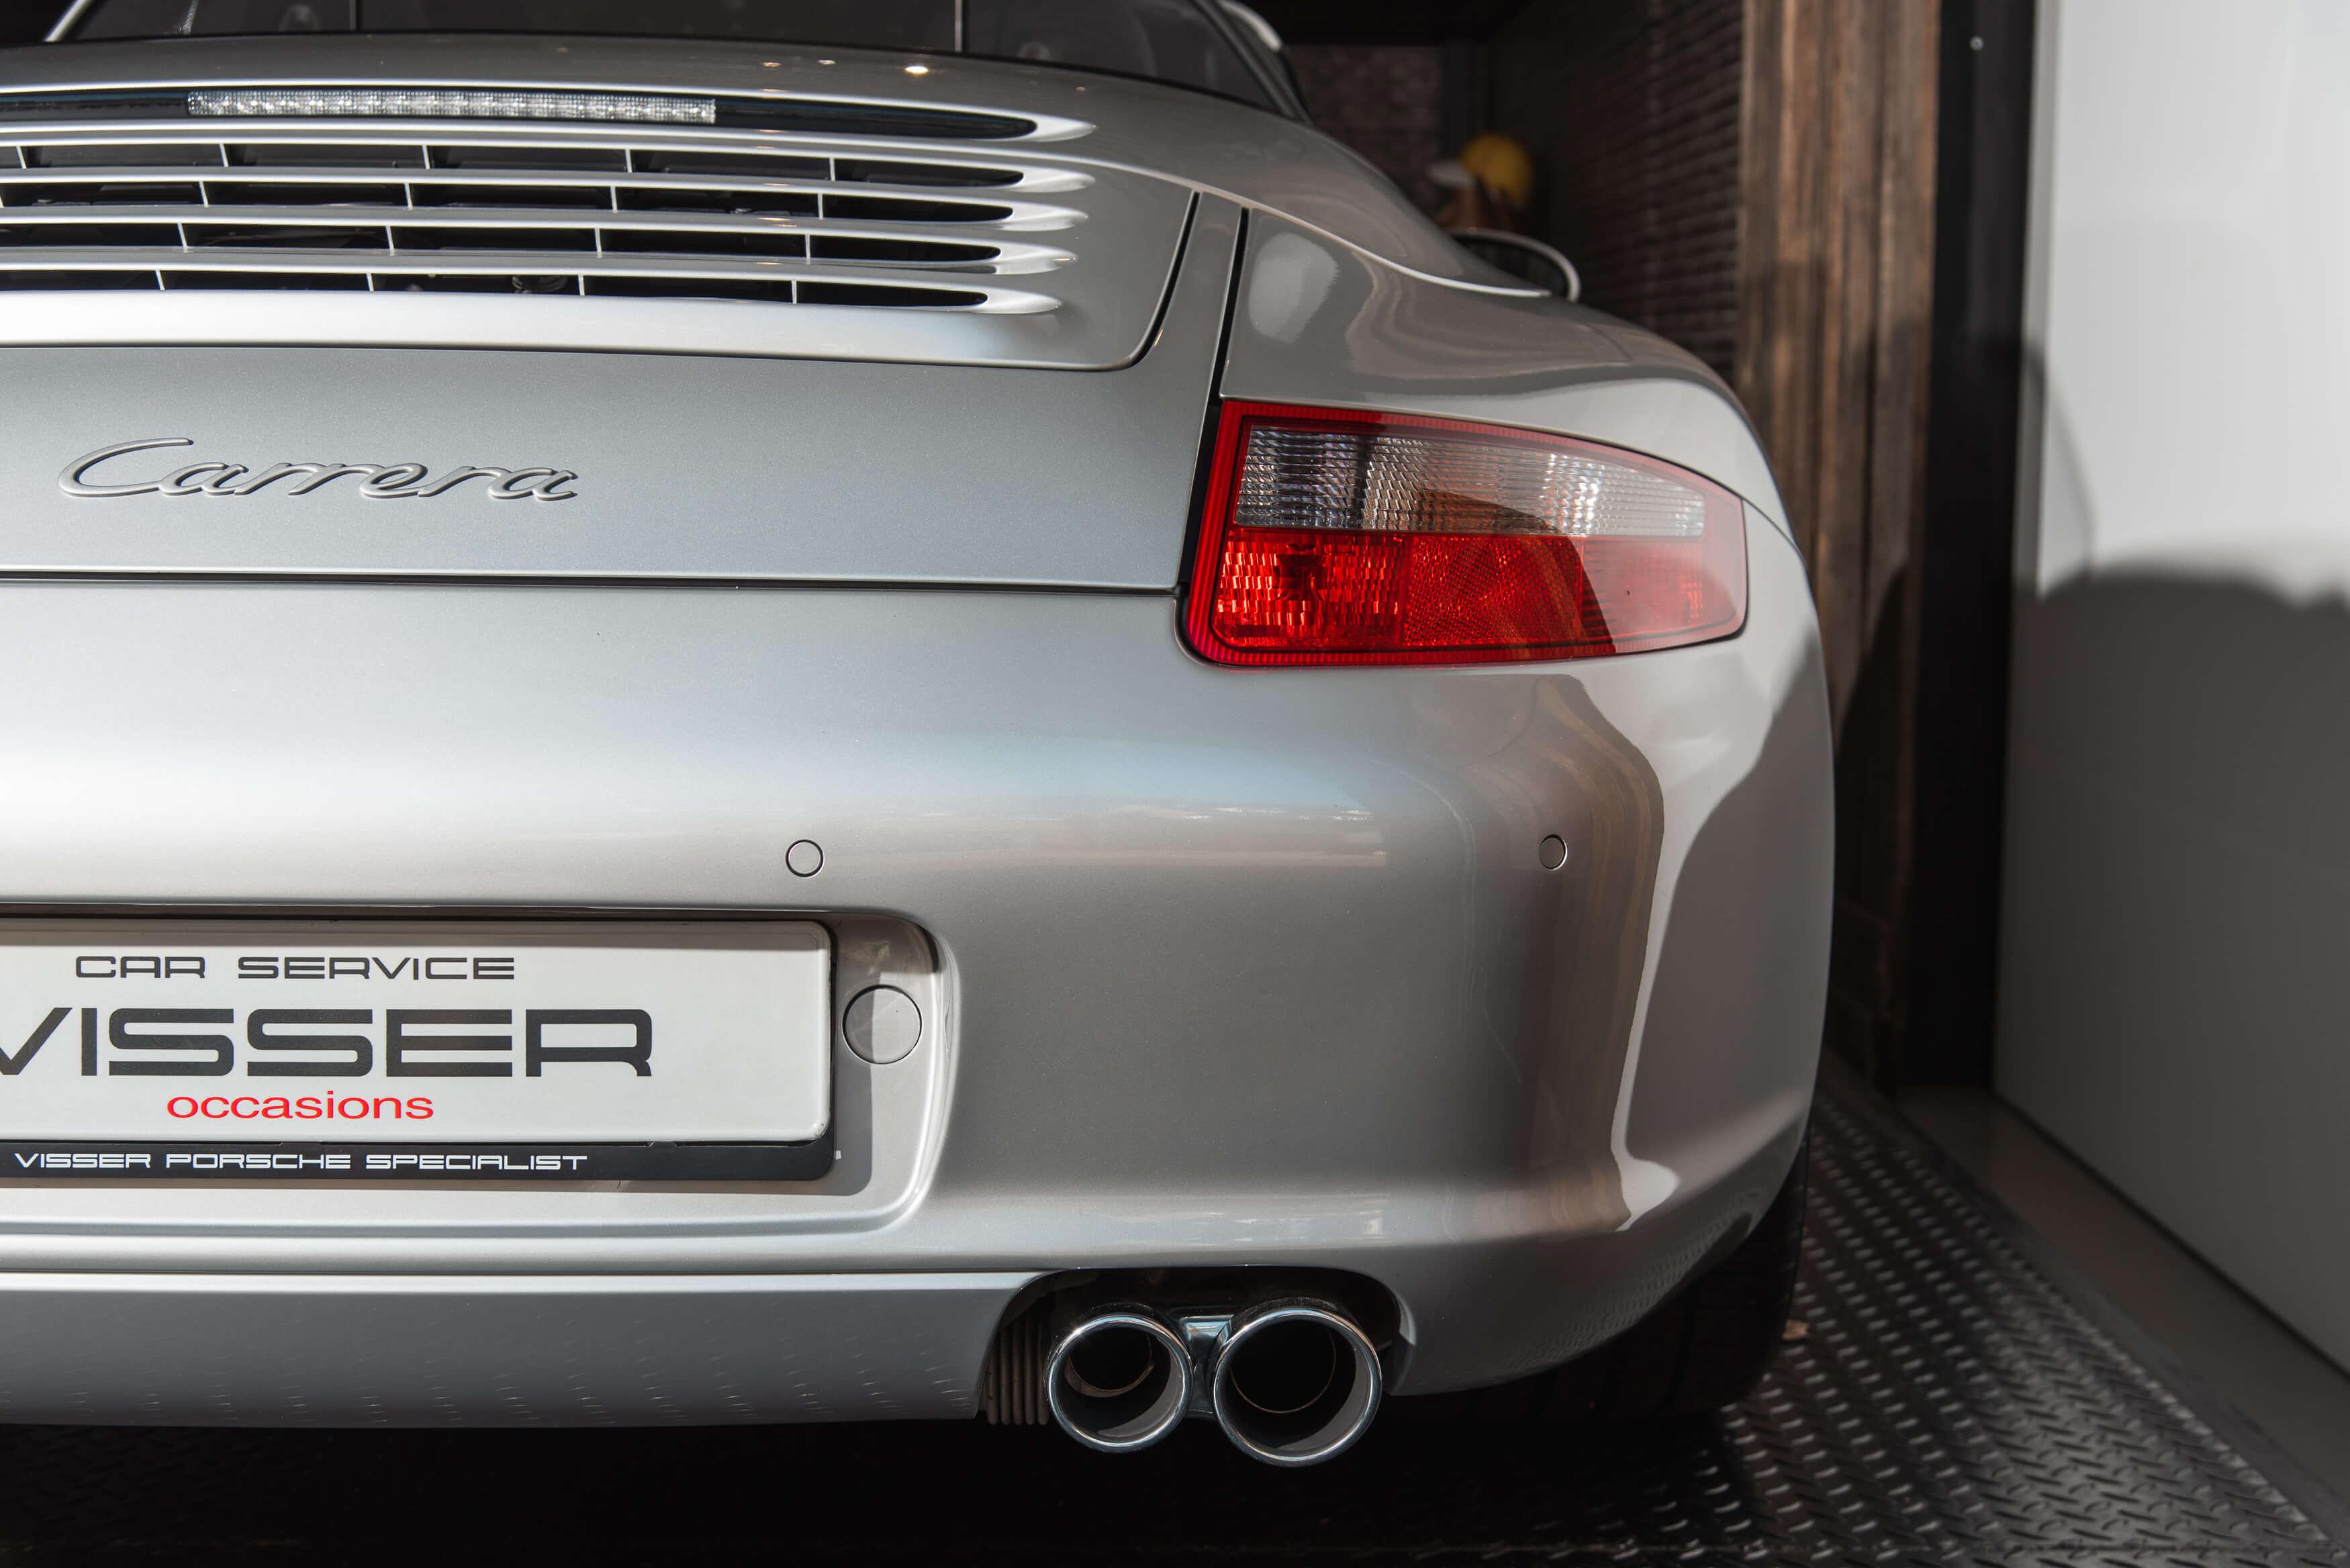 Porsche 997 Carrera 2 automaat Car Service Visser gespecialiseerd in Porsche - 12